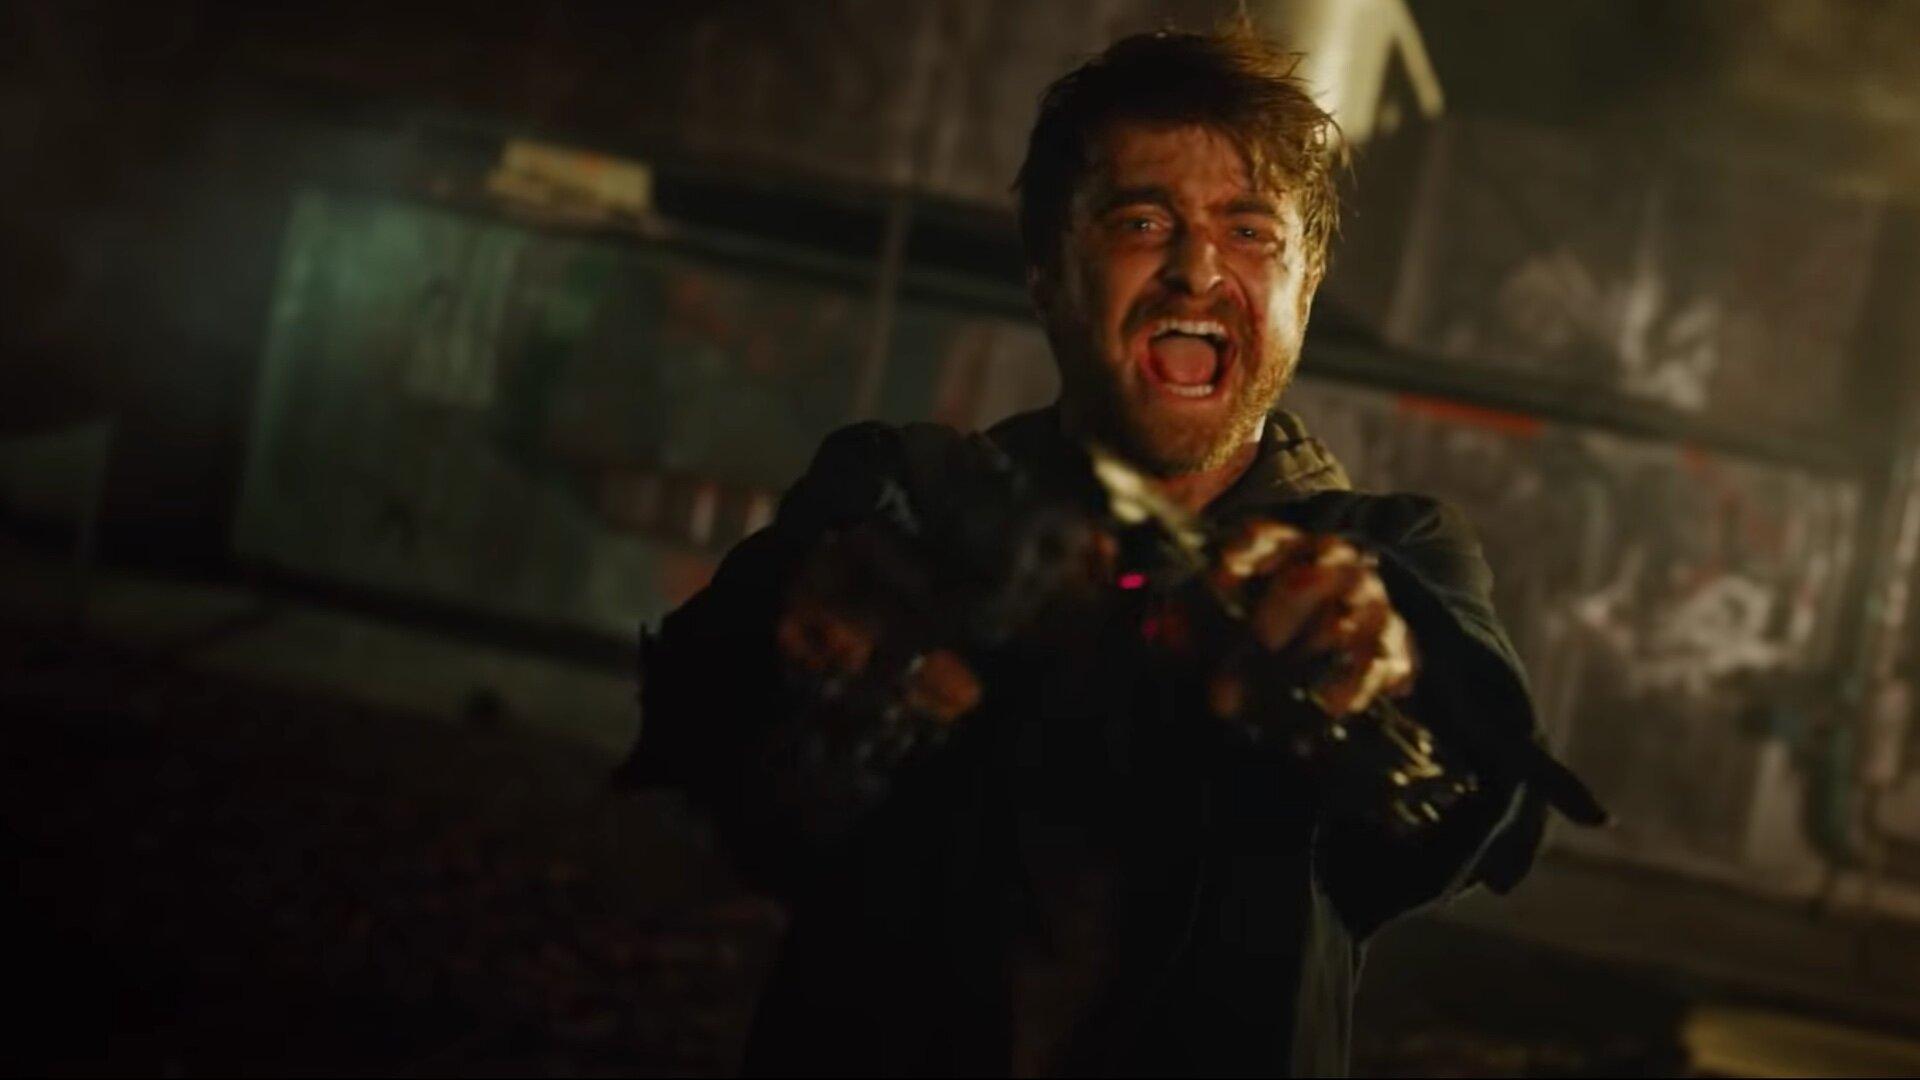 Radcliffe screams as he points two guns.